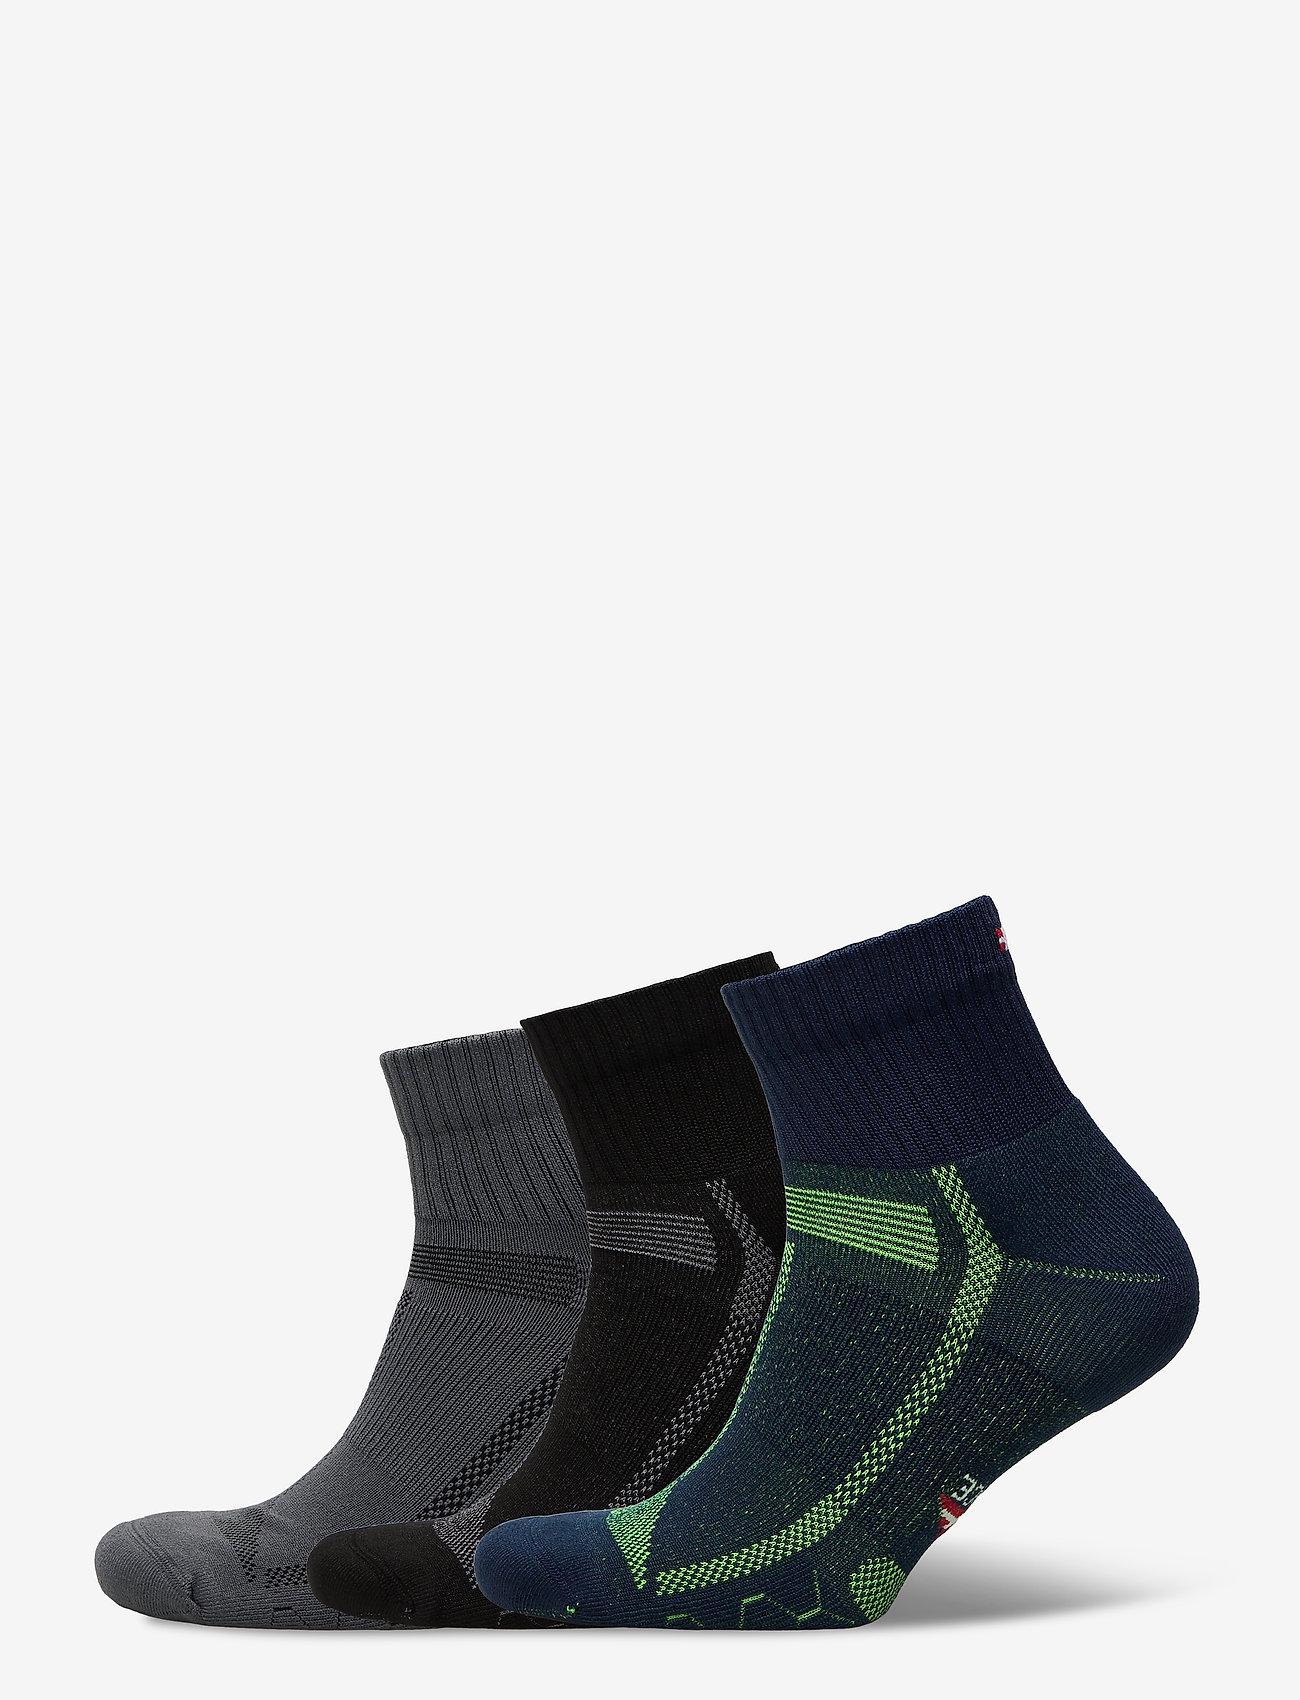 Danish Endurance - Long Distance Running Socks 3 Pack - kousen - multicolor (1x black/grey, 1x blue/yellow, 1x grey/black) - 0